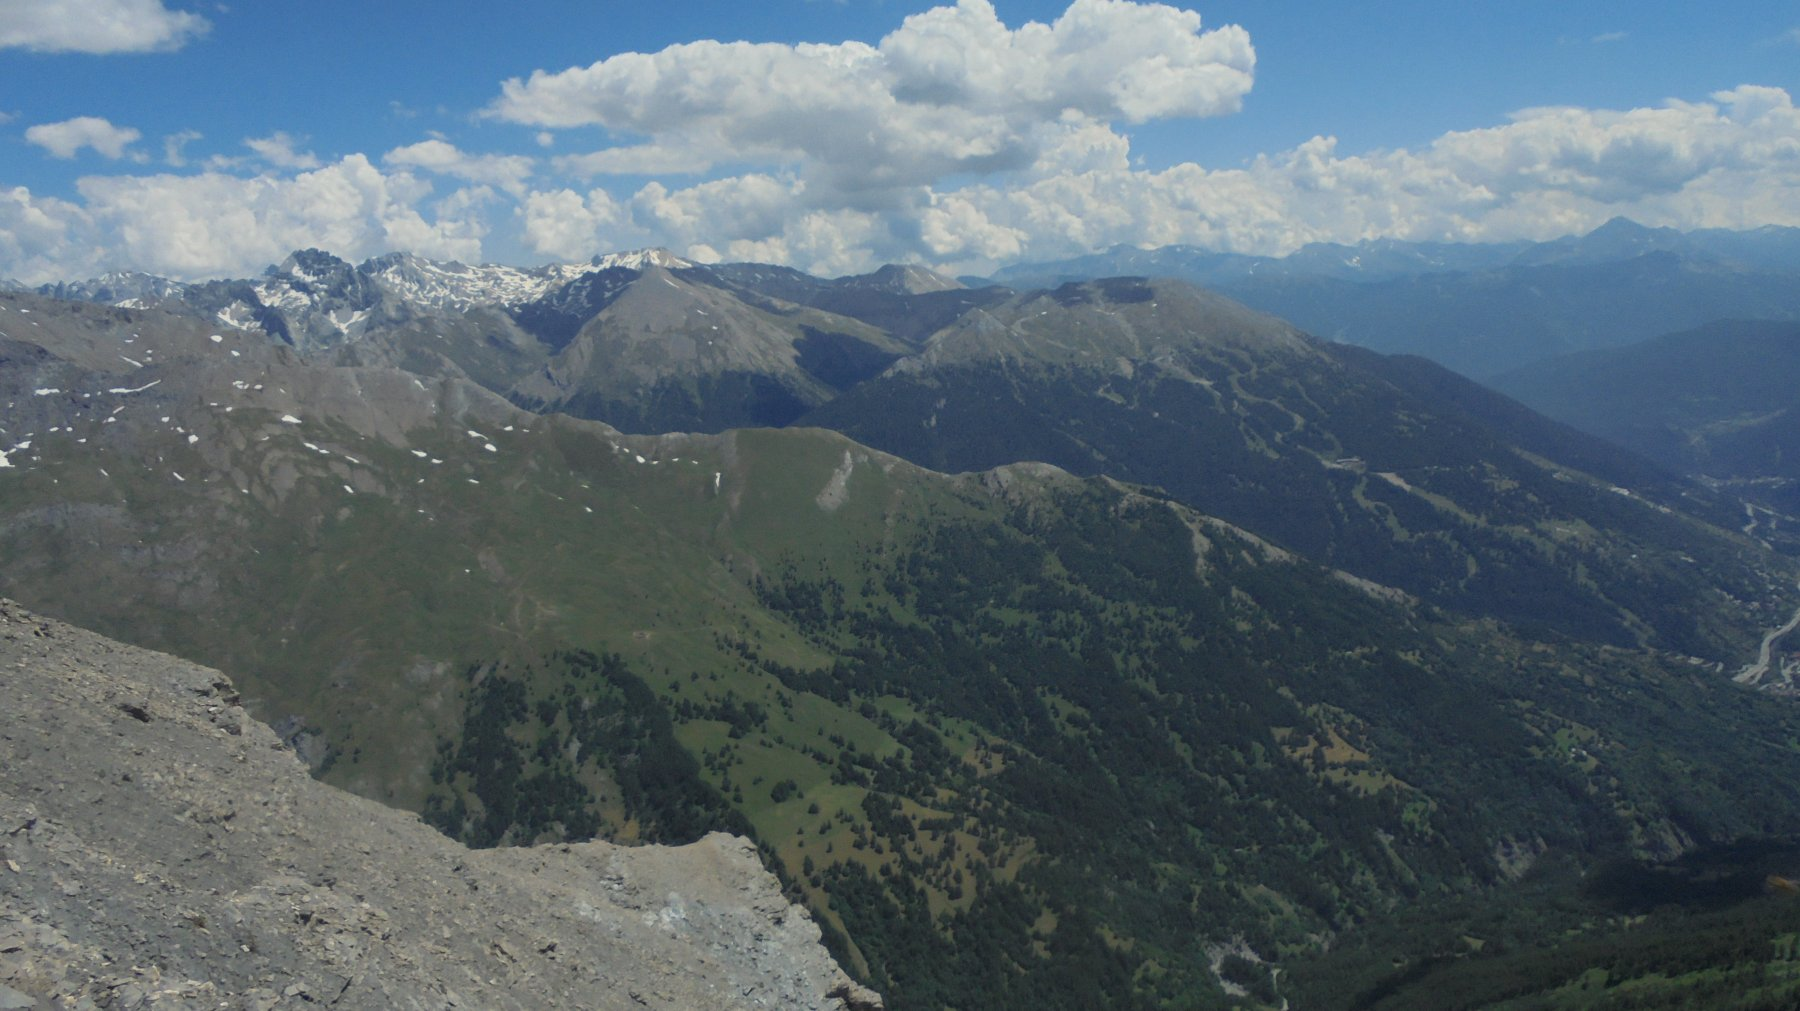 Verso lo Jafferau e la valle del Frejus